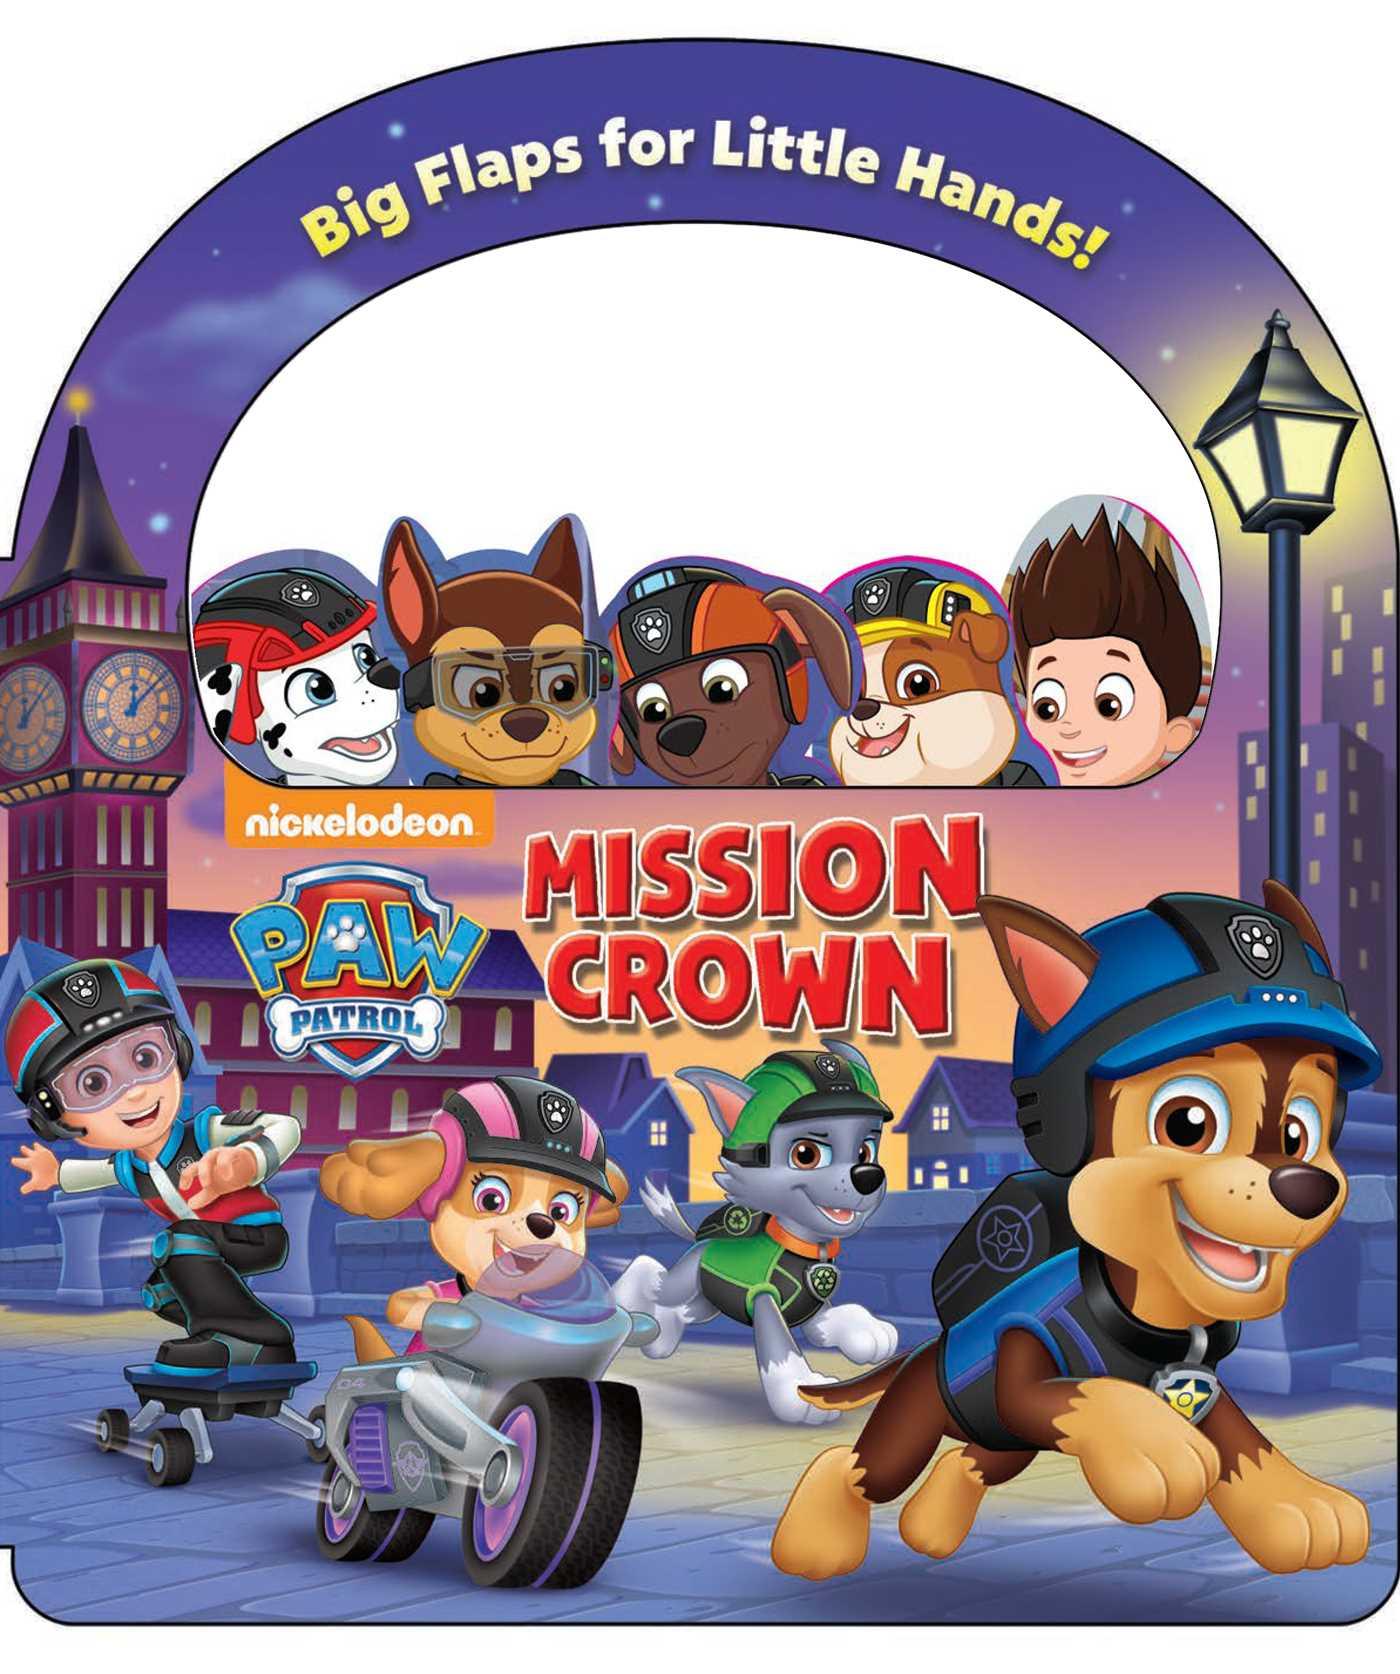 Paw patrol mission crown 9780794442132 hr